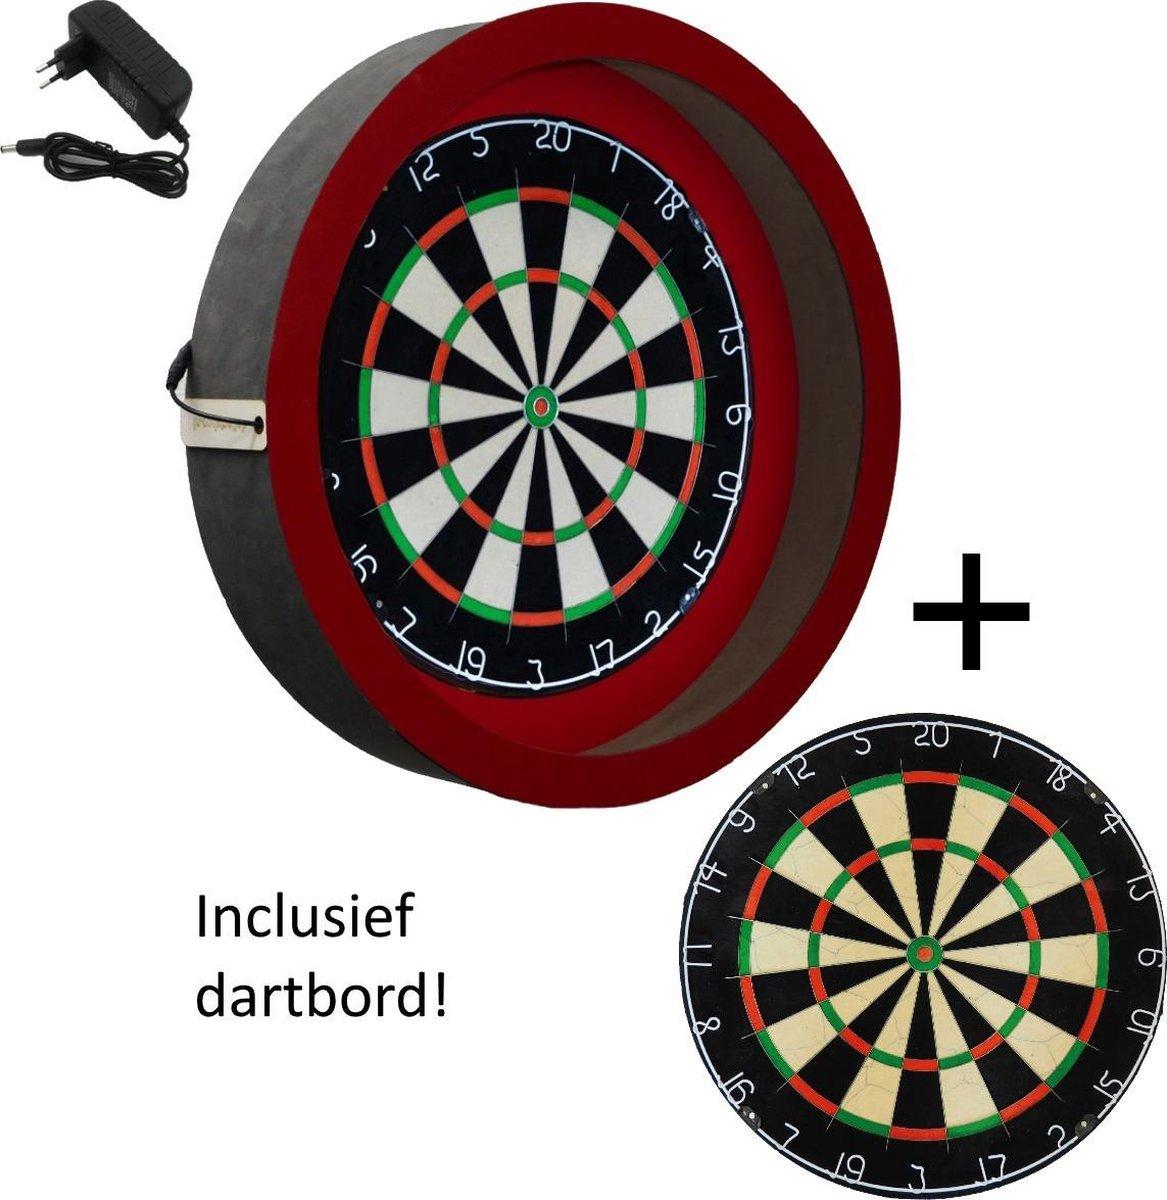 Dragon darts - dartbord verlichting - incl. dartbord - Sorpresa PRO - Rood - dartbord berscherm ring - dartbord